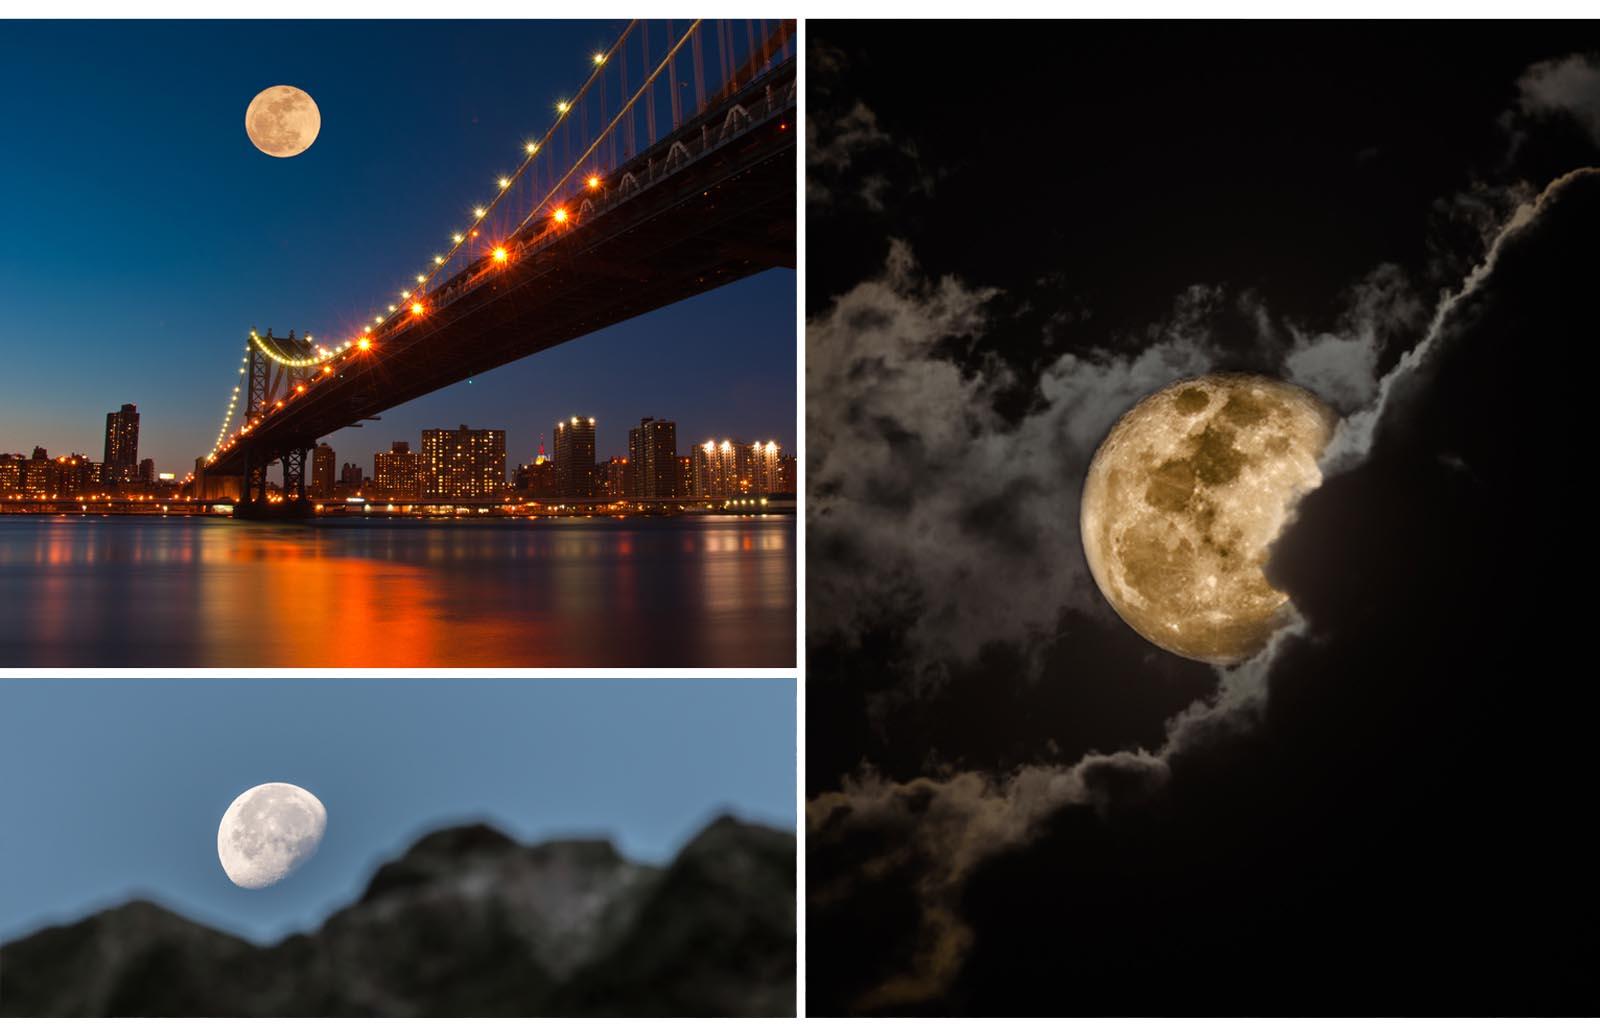 nighttime photography skills